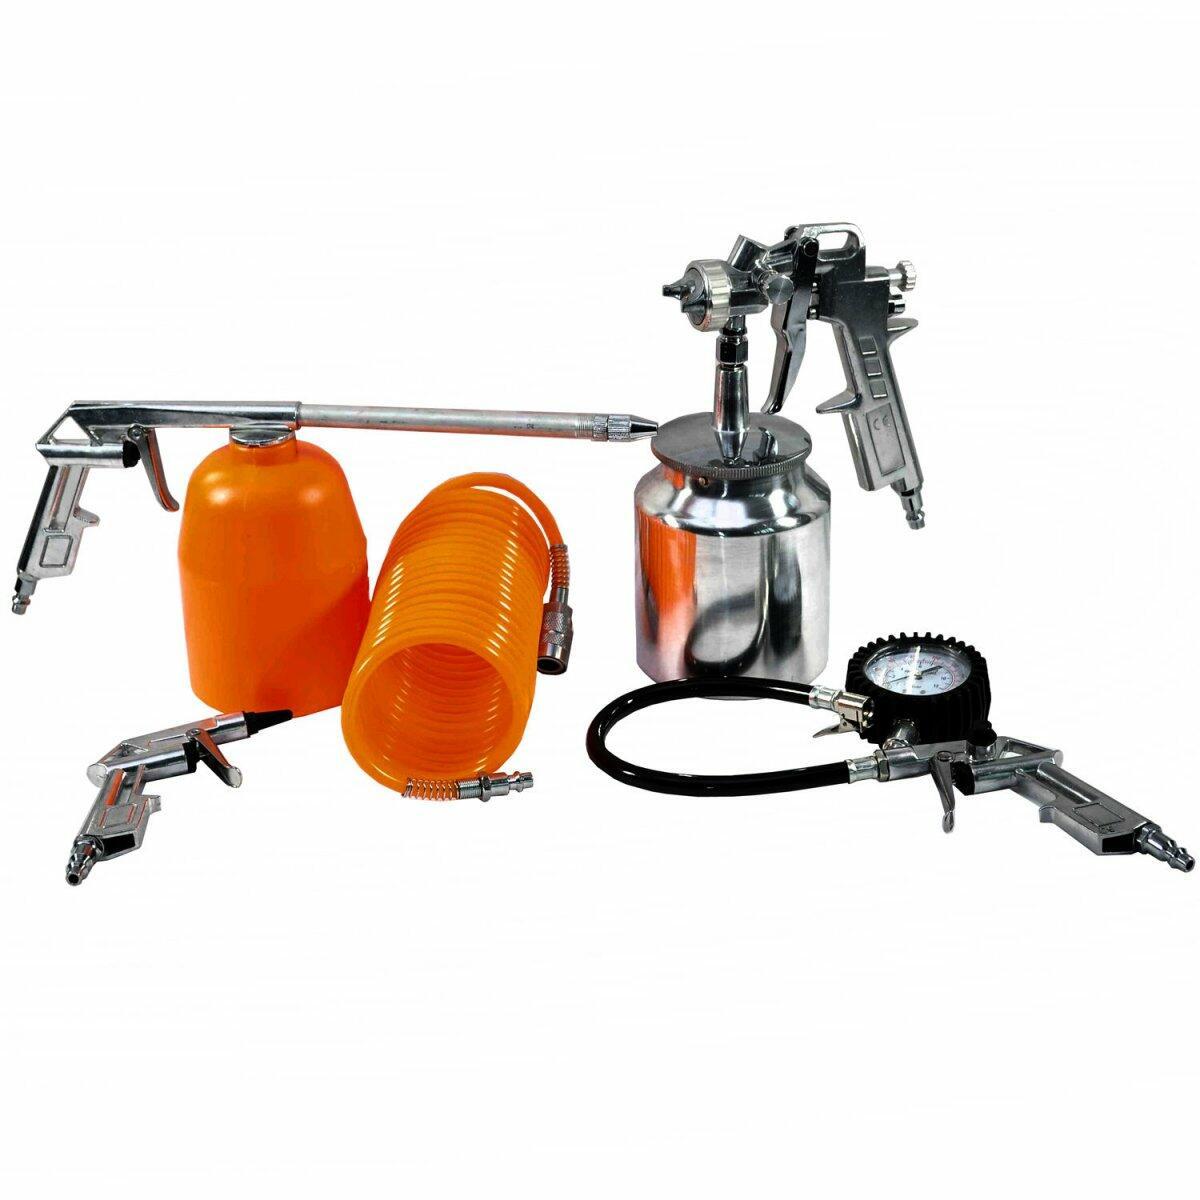 Kit De Pintura E Oficina Para Compressor 210500 Belfix - 5 Peças